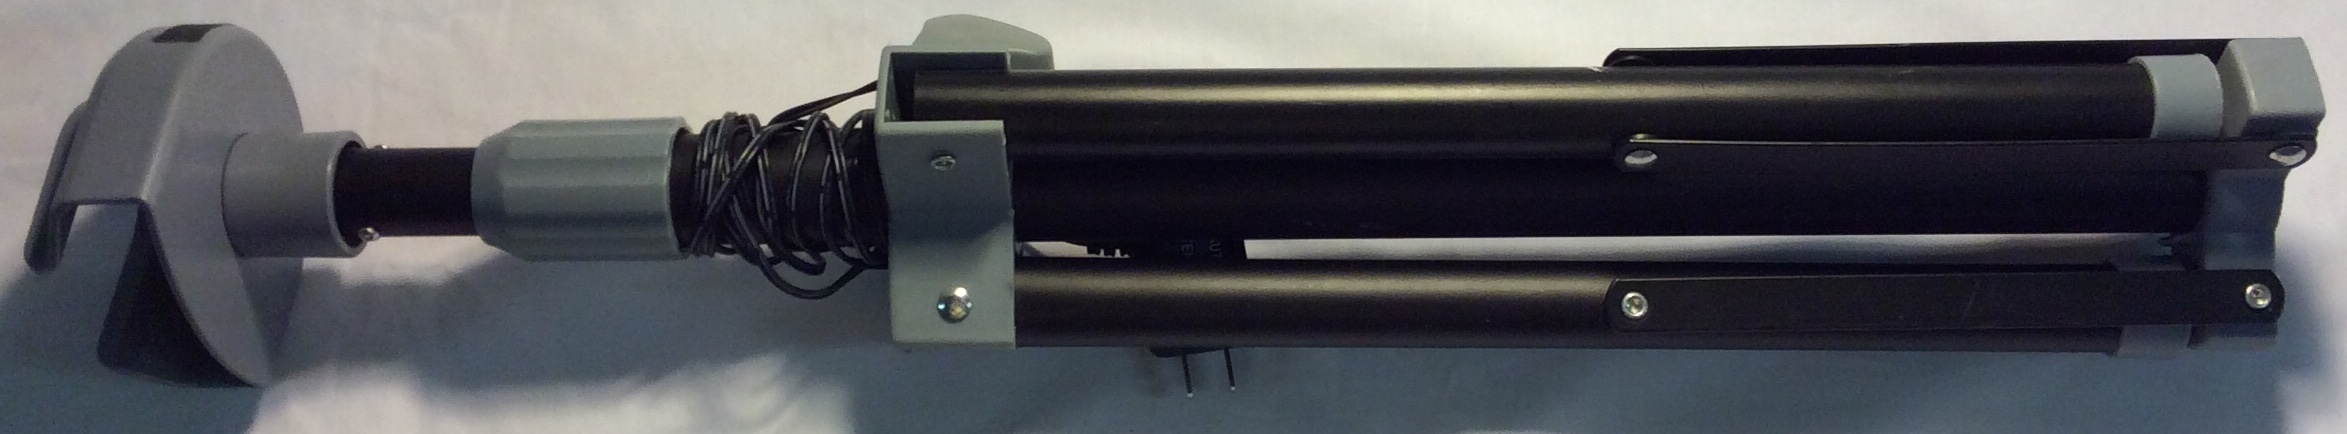 Motomaster Tripod light stand, black